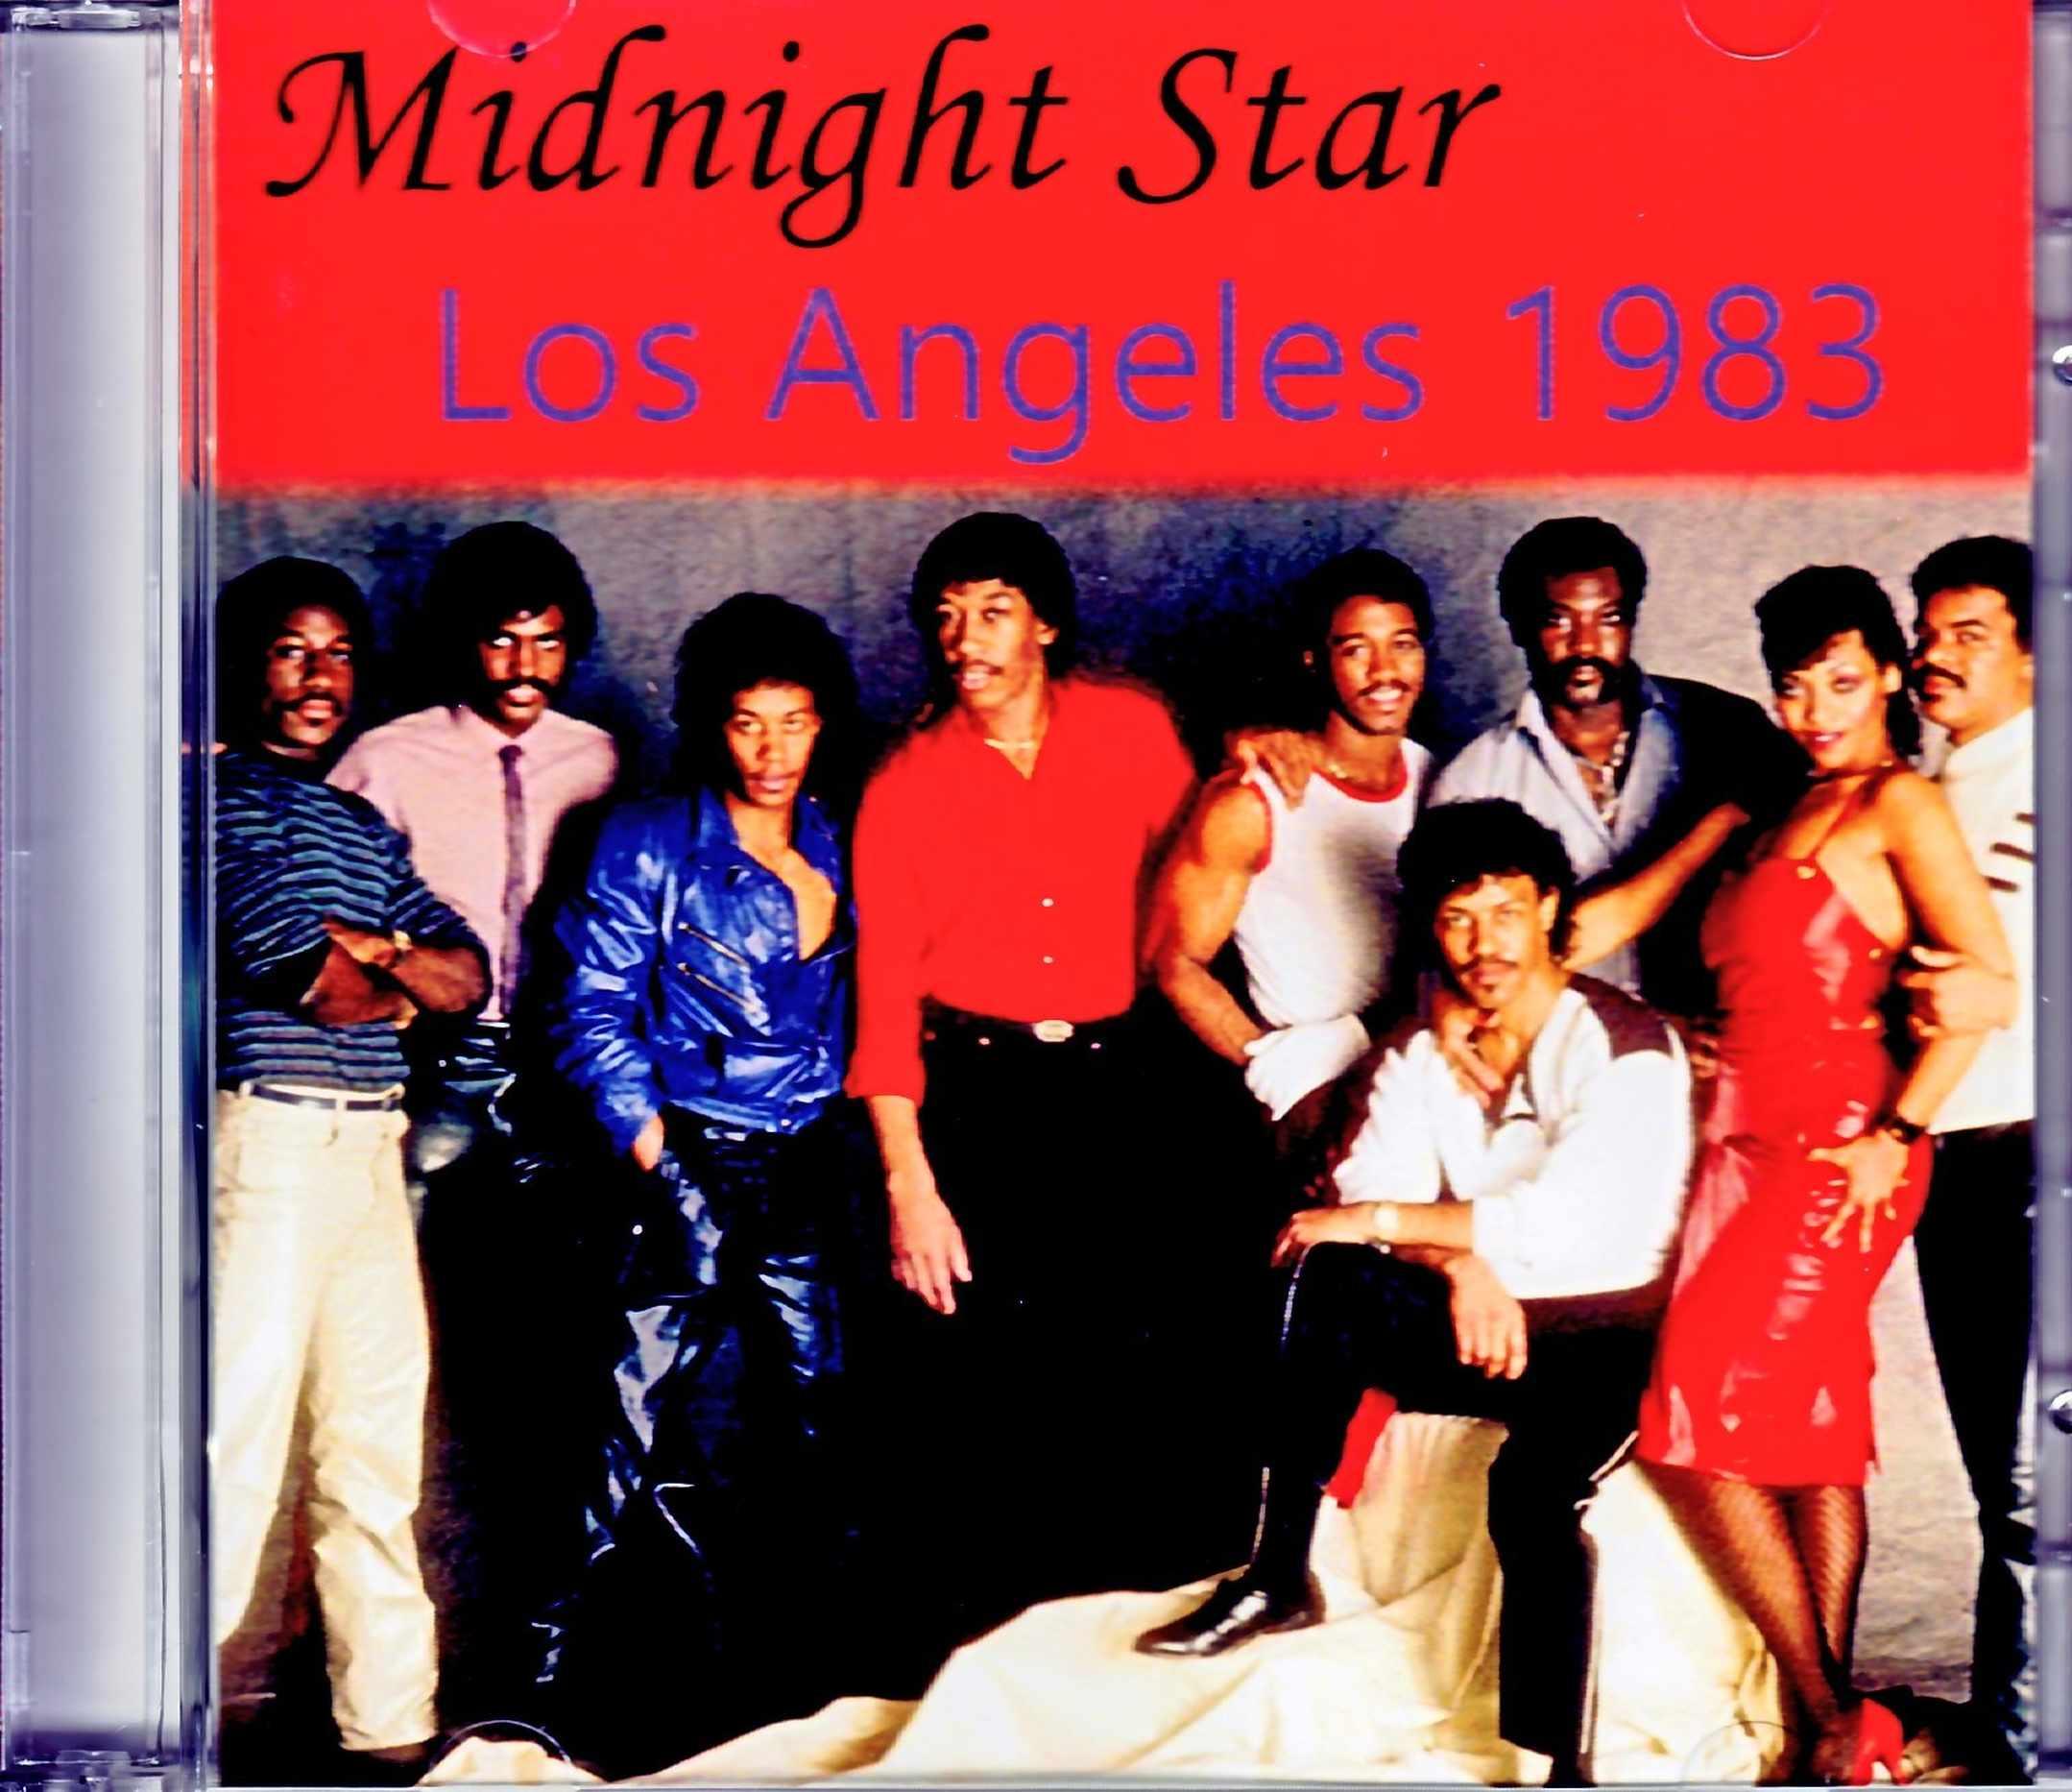 Midnight Star ミッドナイト・スター/CA,USA 1983 S & V